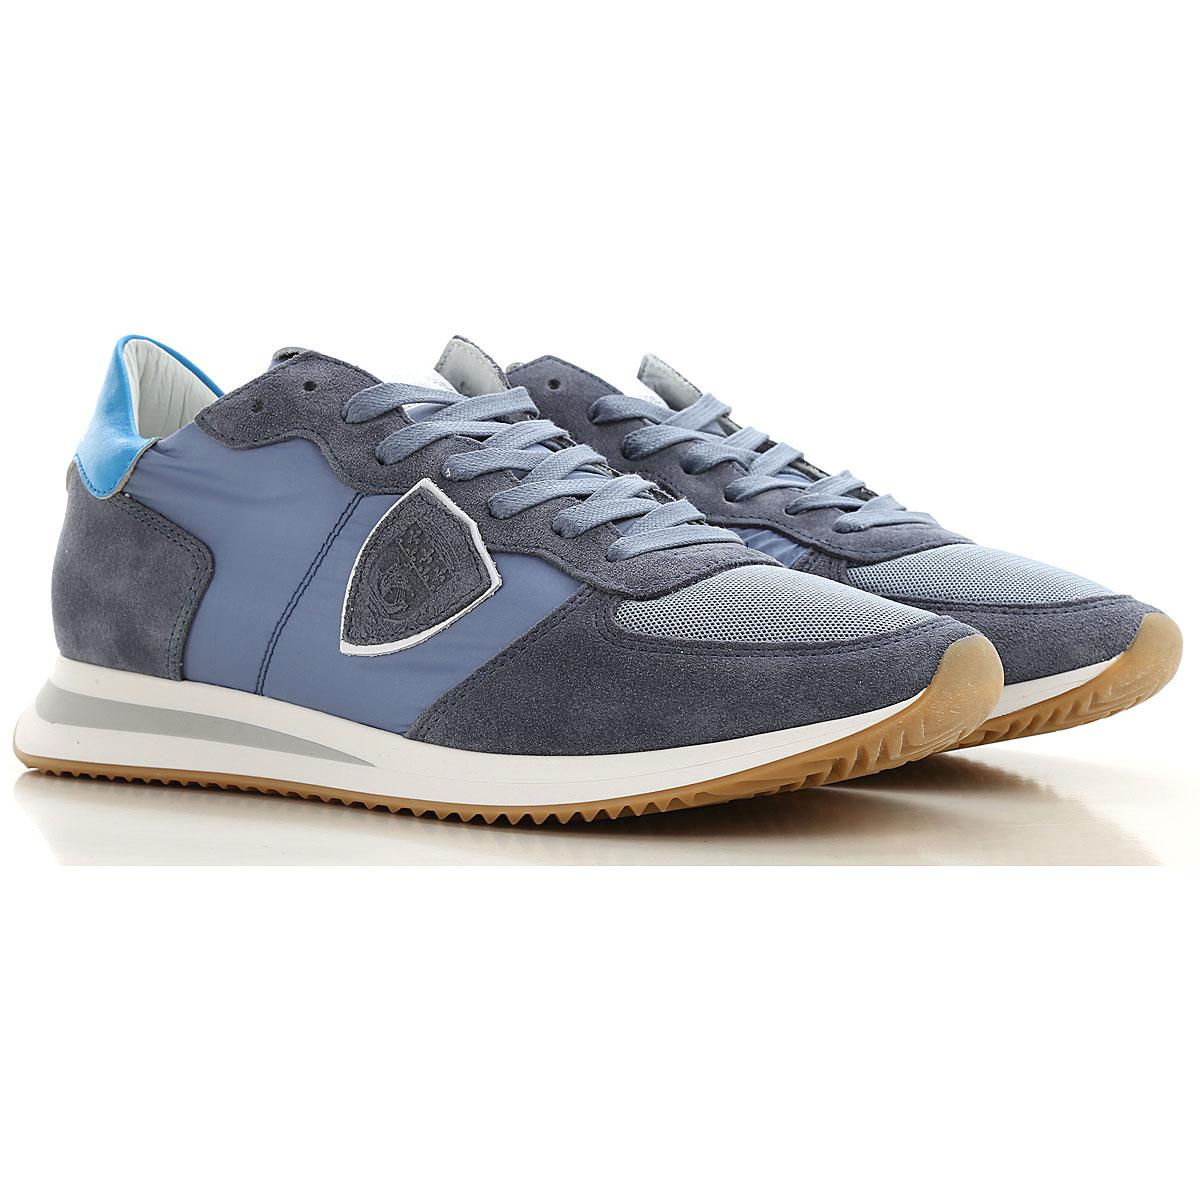 Philippe Model Sneakers for Men On Sale, Bluette, Nylon, 2019, 10 10.5 11.5 7.5 8 9